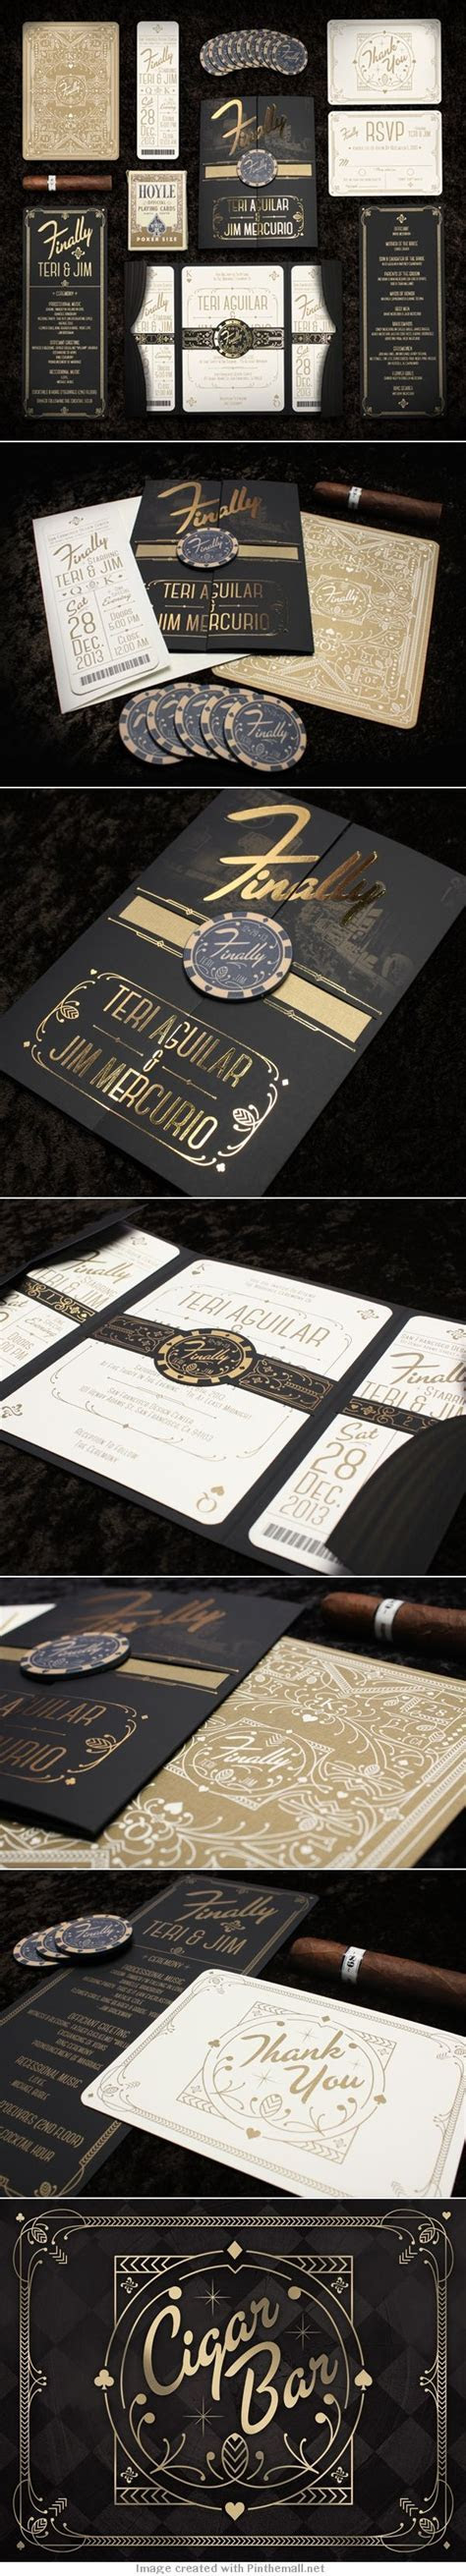 Mercurio Wedding Invitations inspiration from the